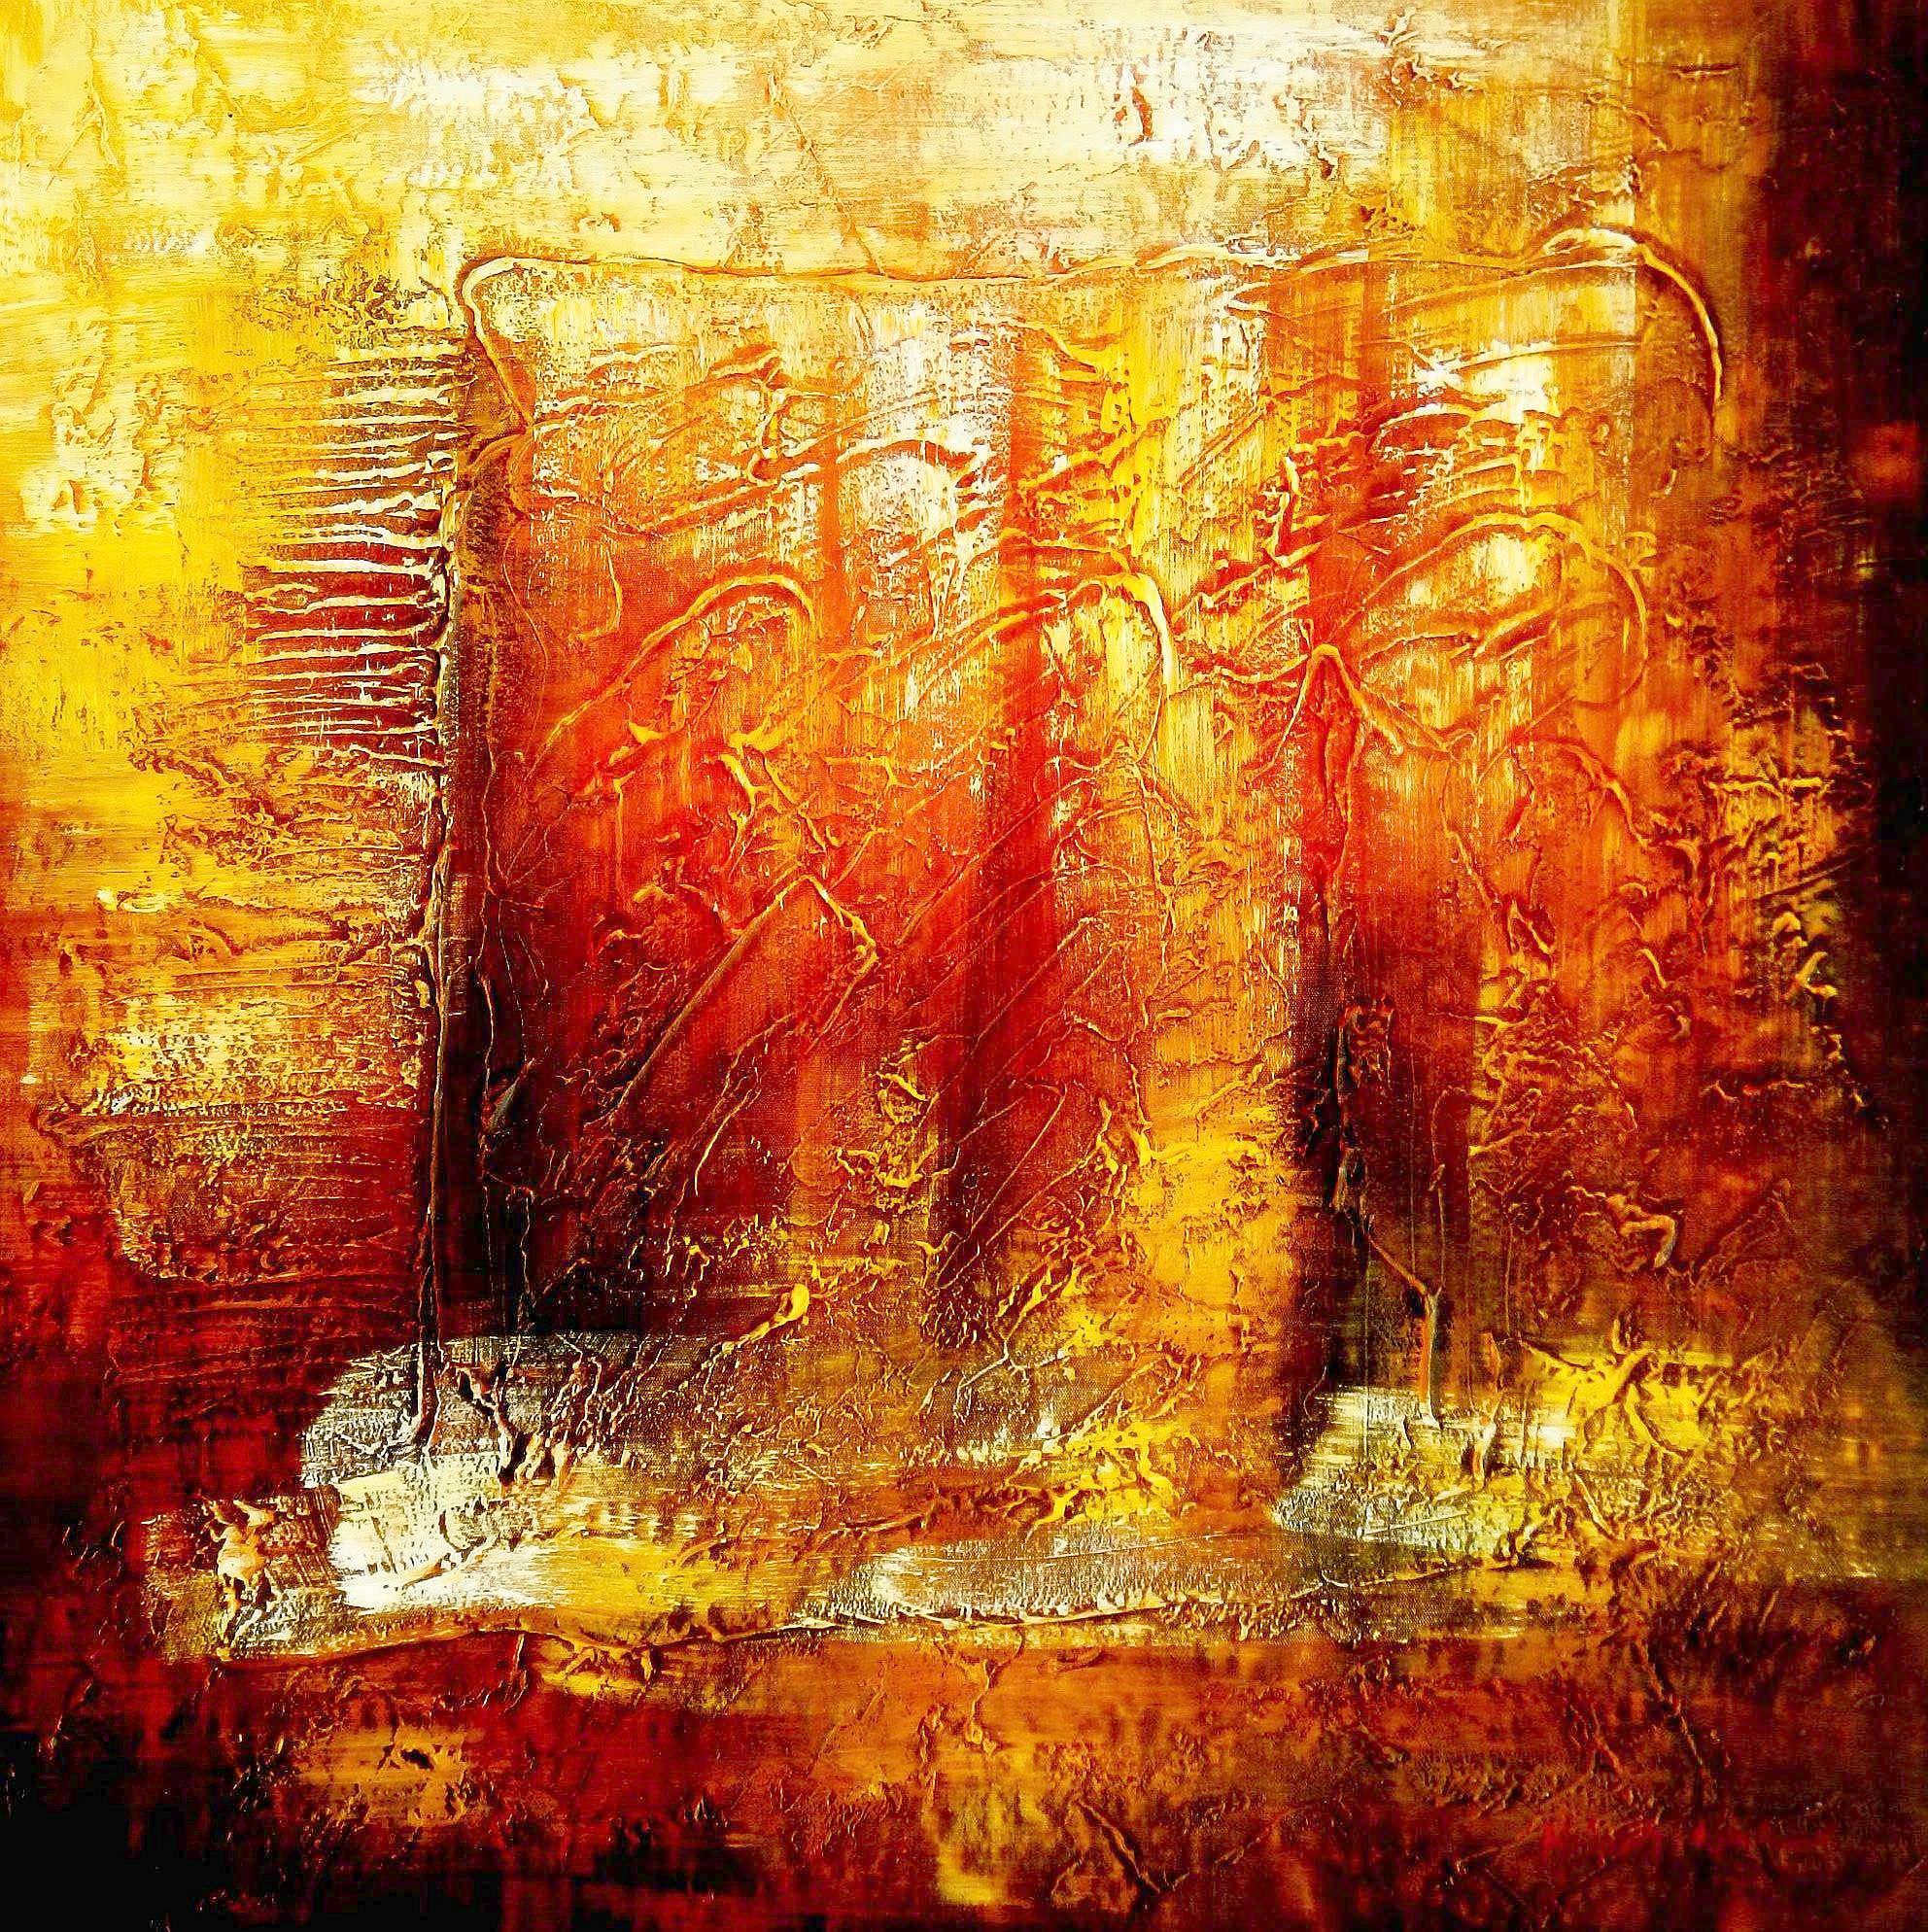 Abstract - Legacy of Fire III g96171 80x80cm abstraktes Ölbild handgemalt